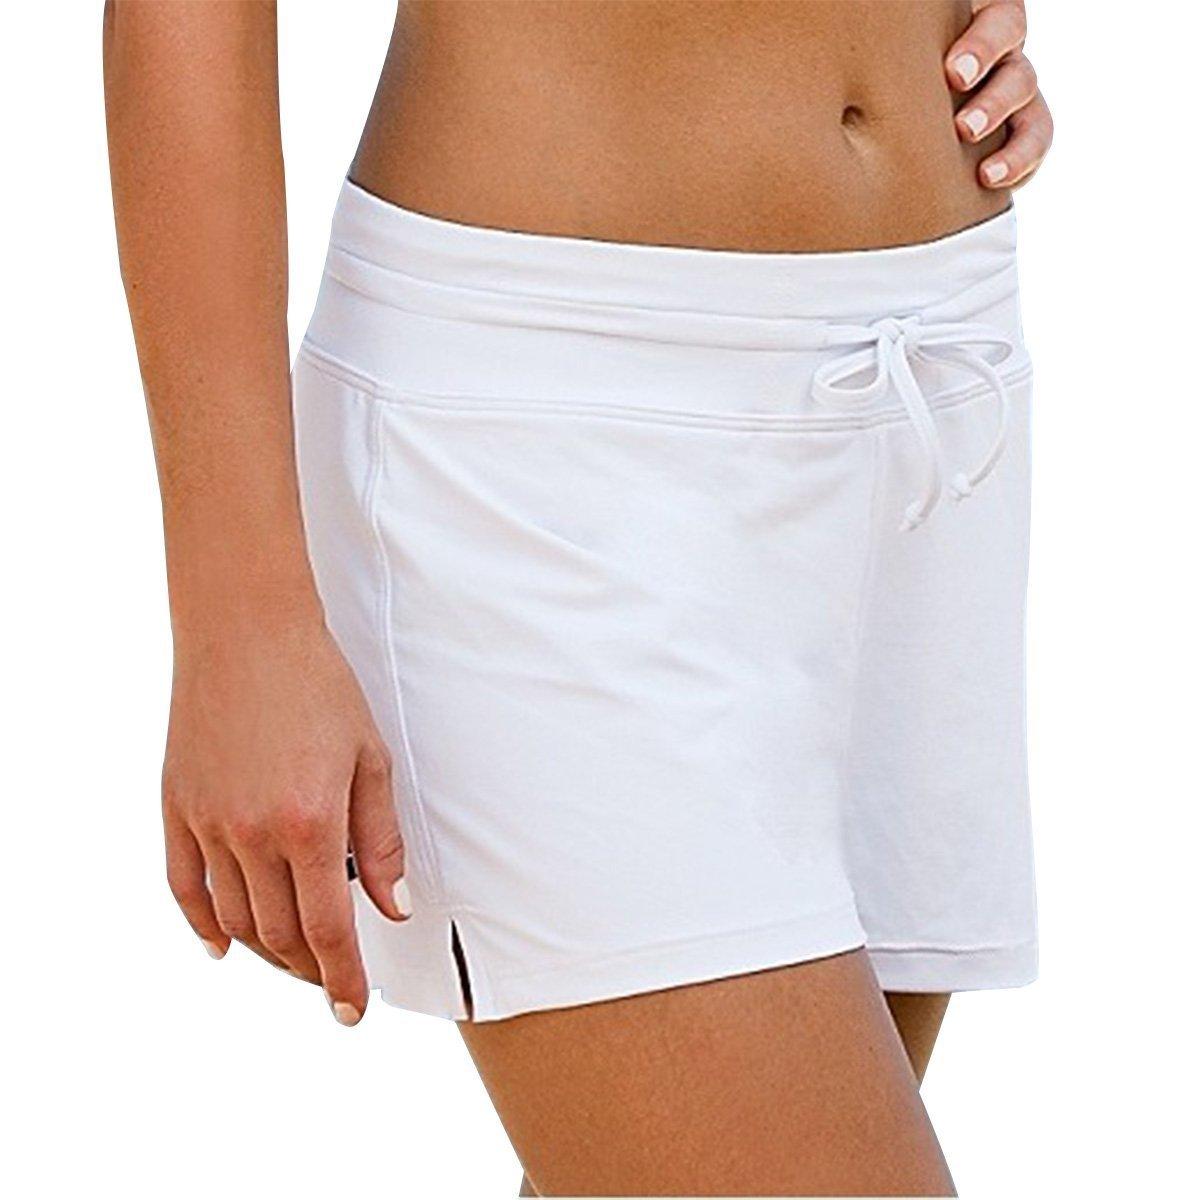 HOLYSNOW Women's Stretch Quick Dry Tankini Bottoms Briefs Inner Board Short M